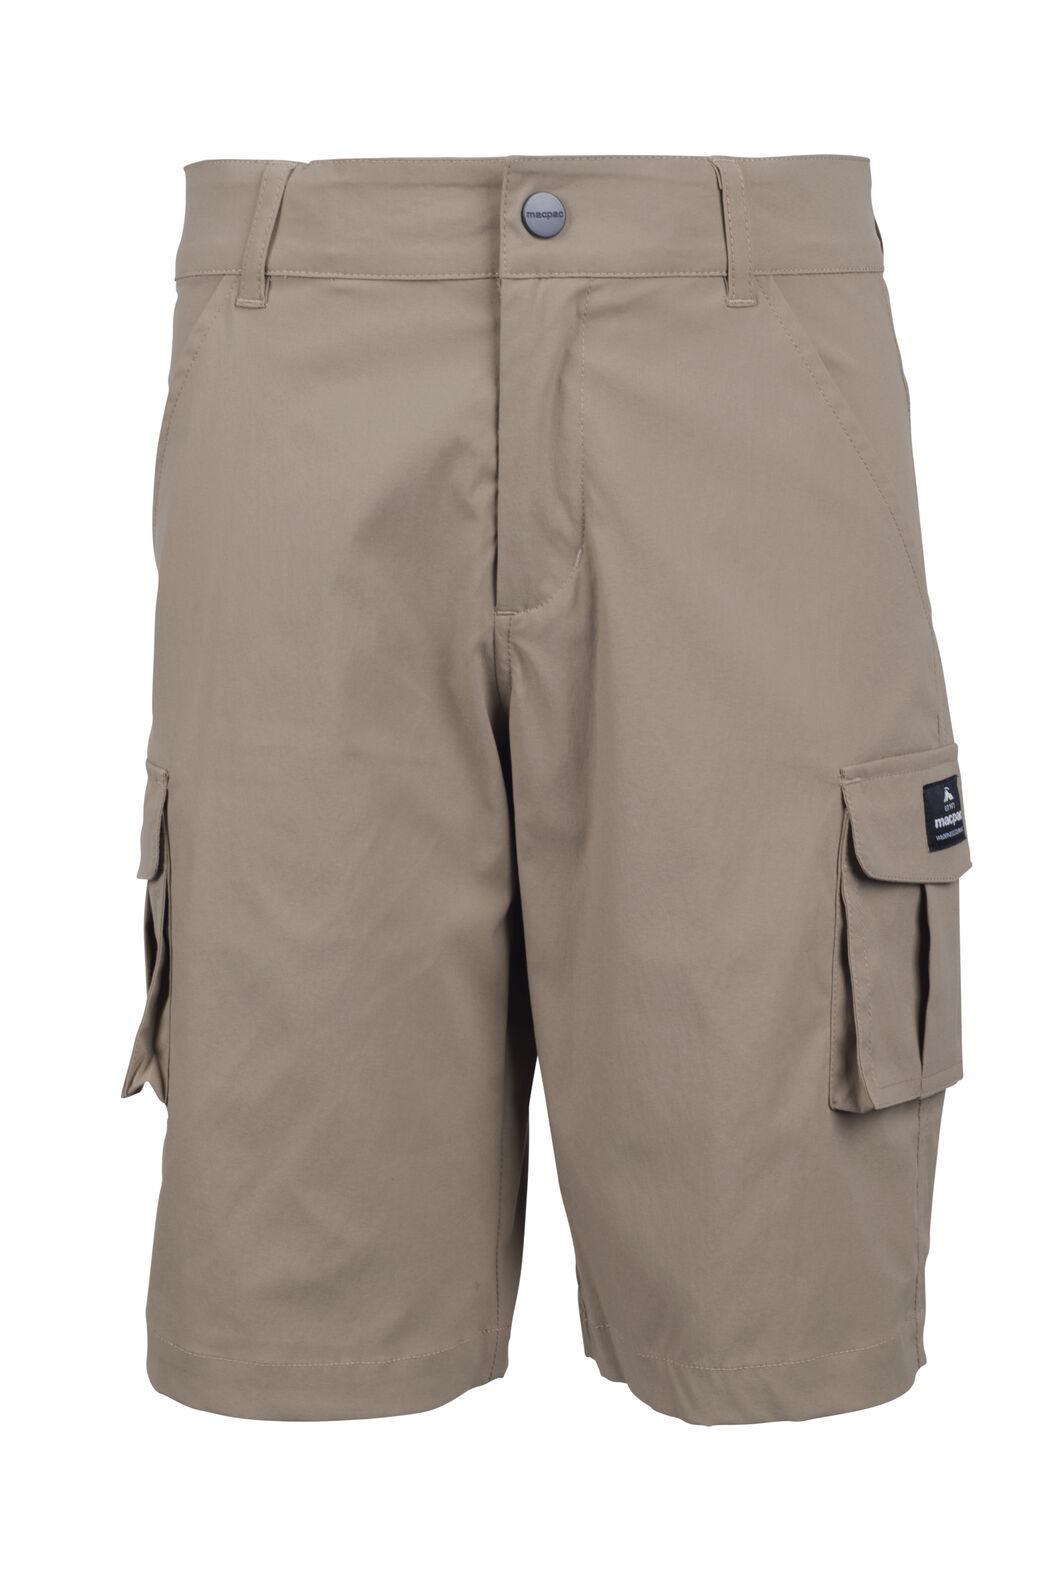 Lil Drifter Shorts - Kids', Lead Grey, hi-res